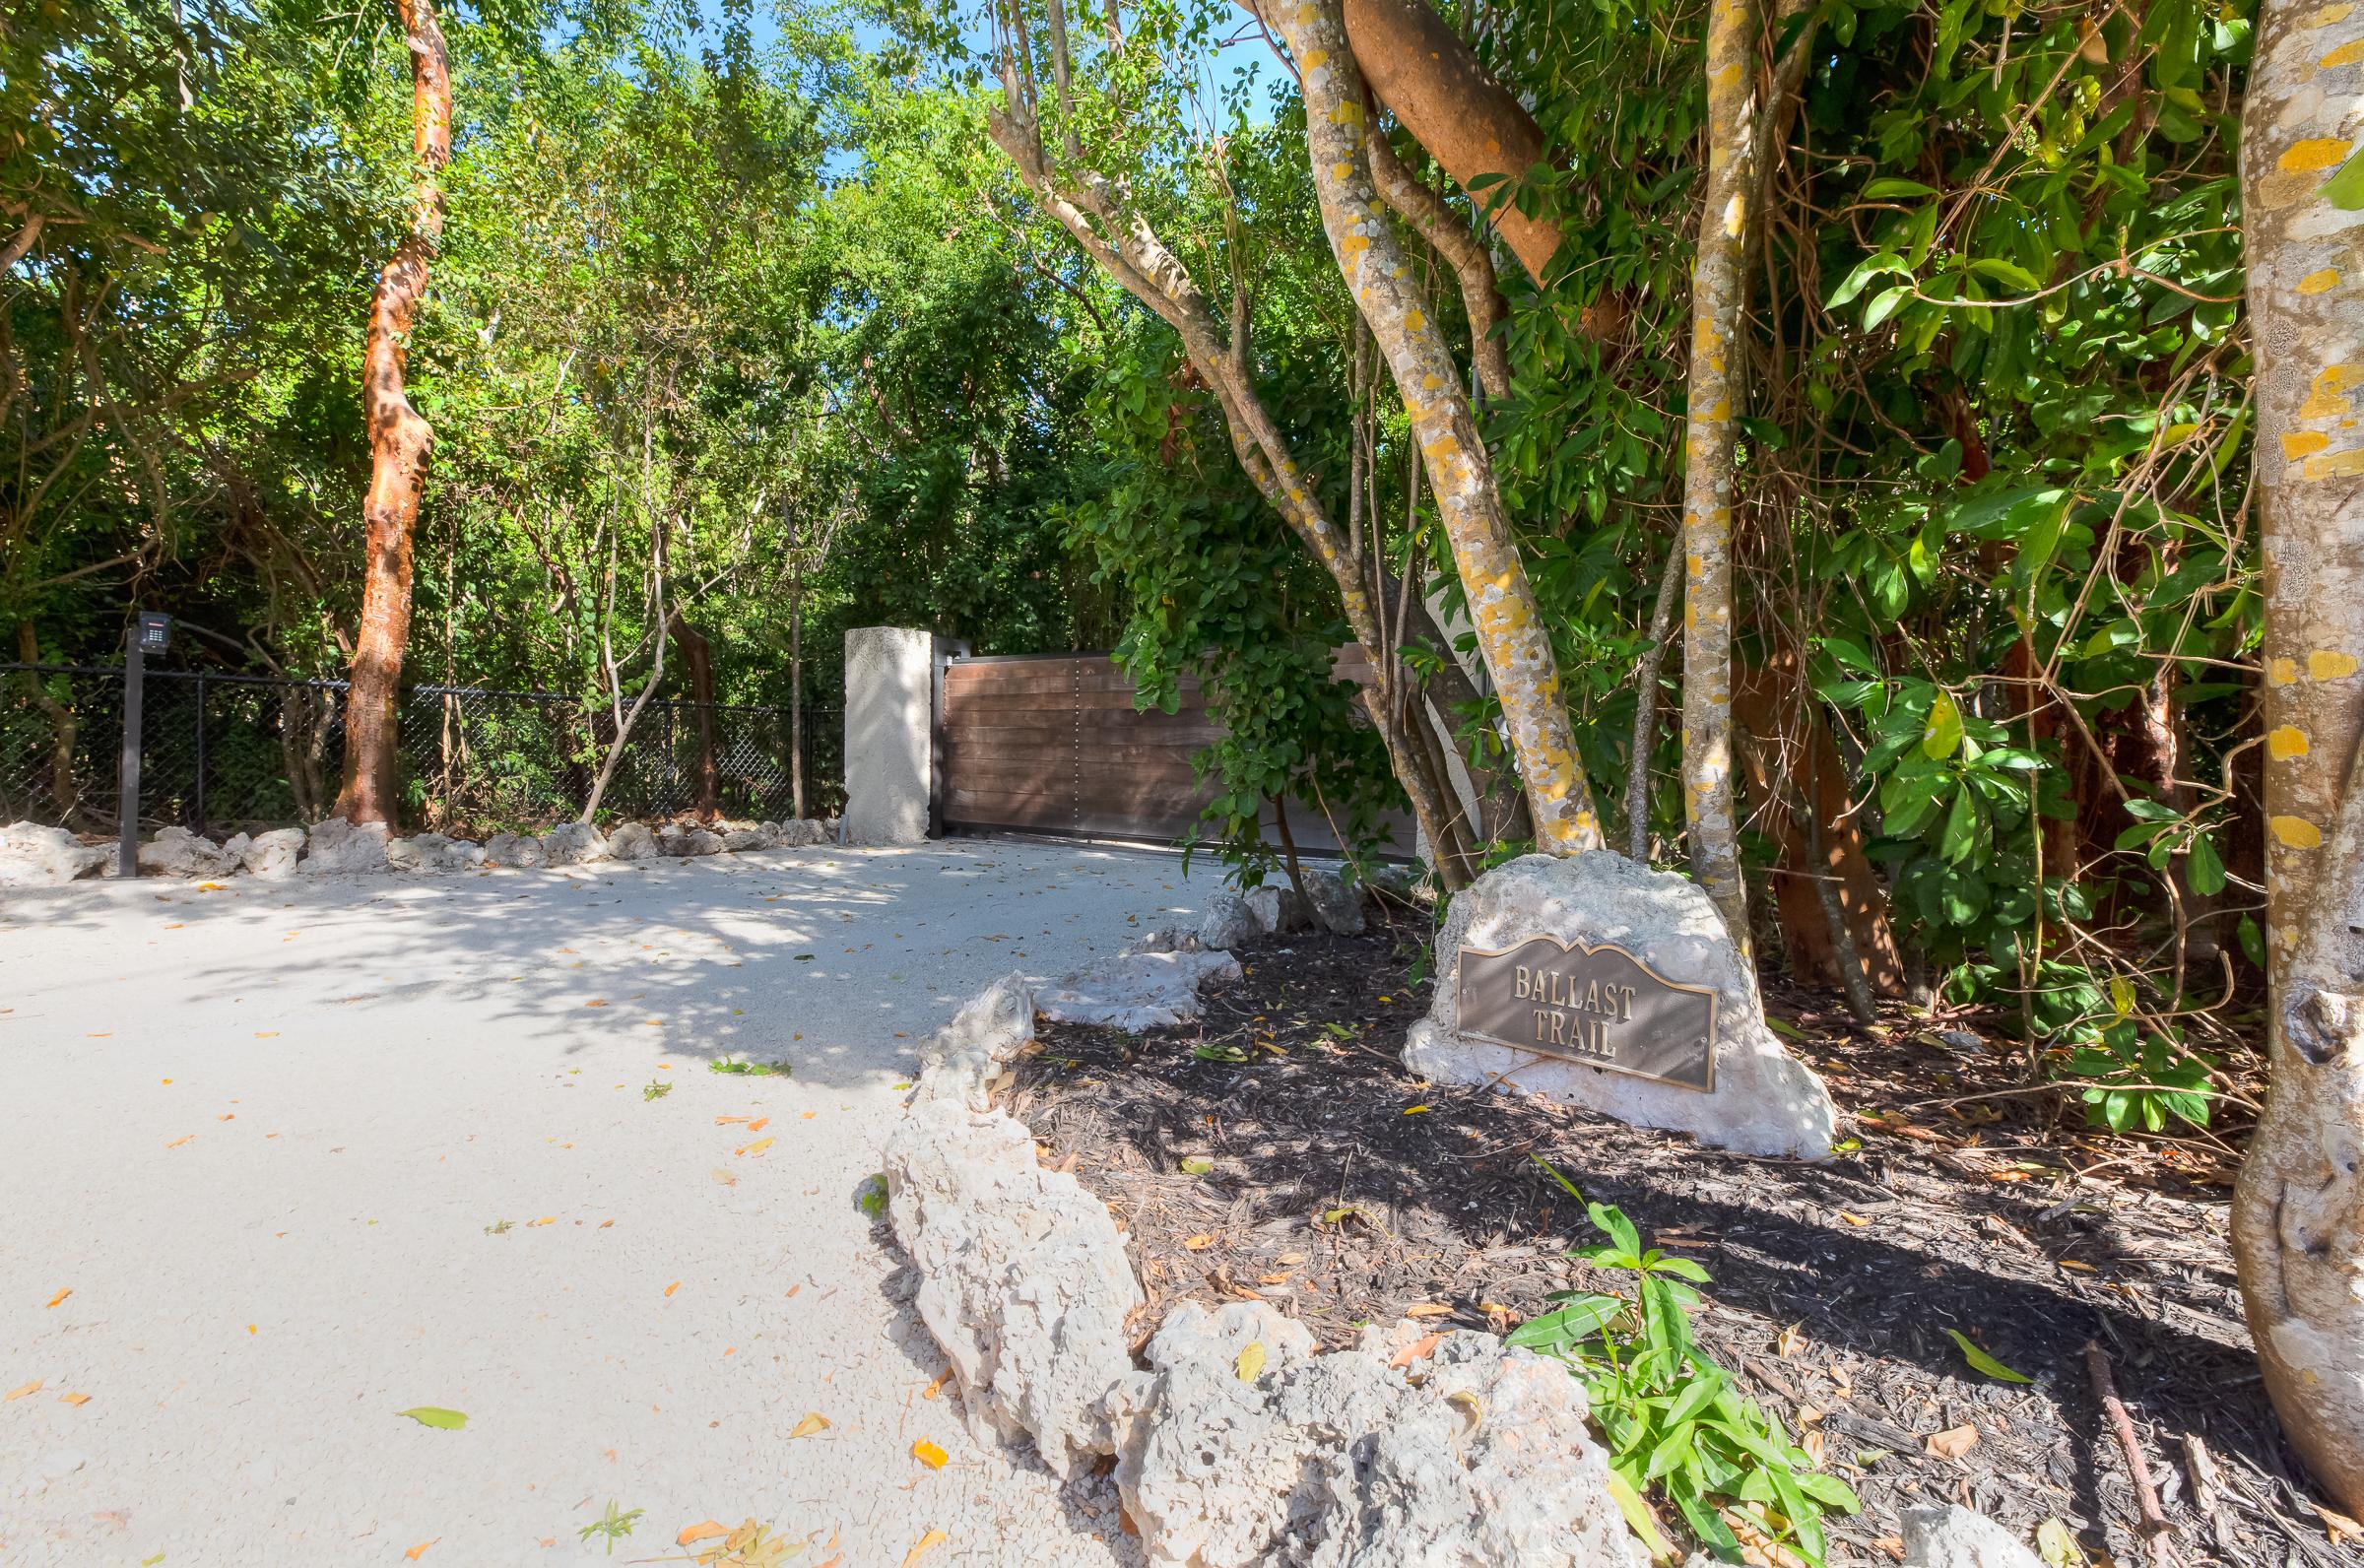 Ballast Trail (122)